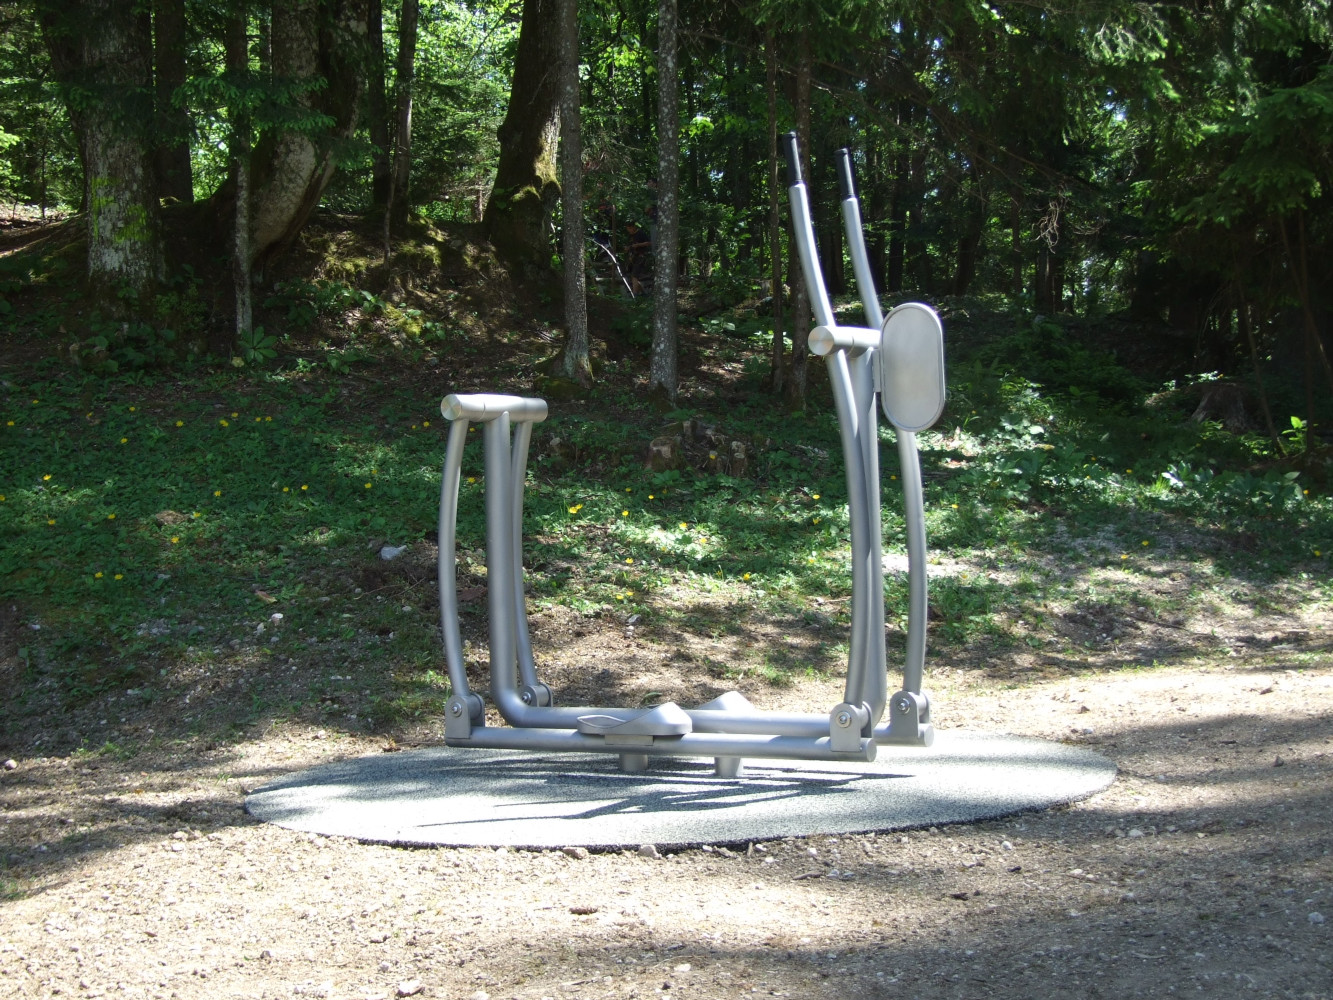 Fitnes Straža na Bledu - tek na smučeh